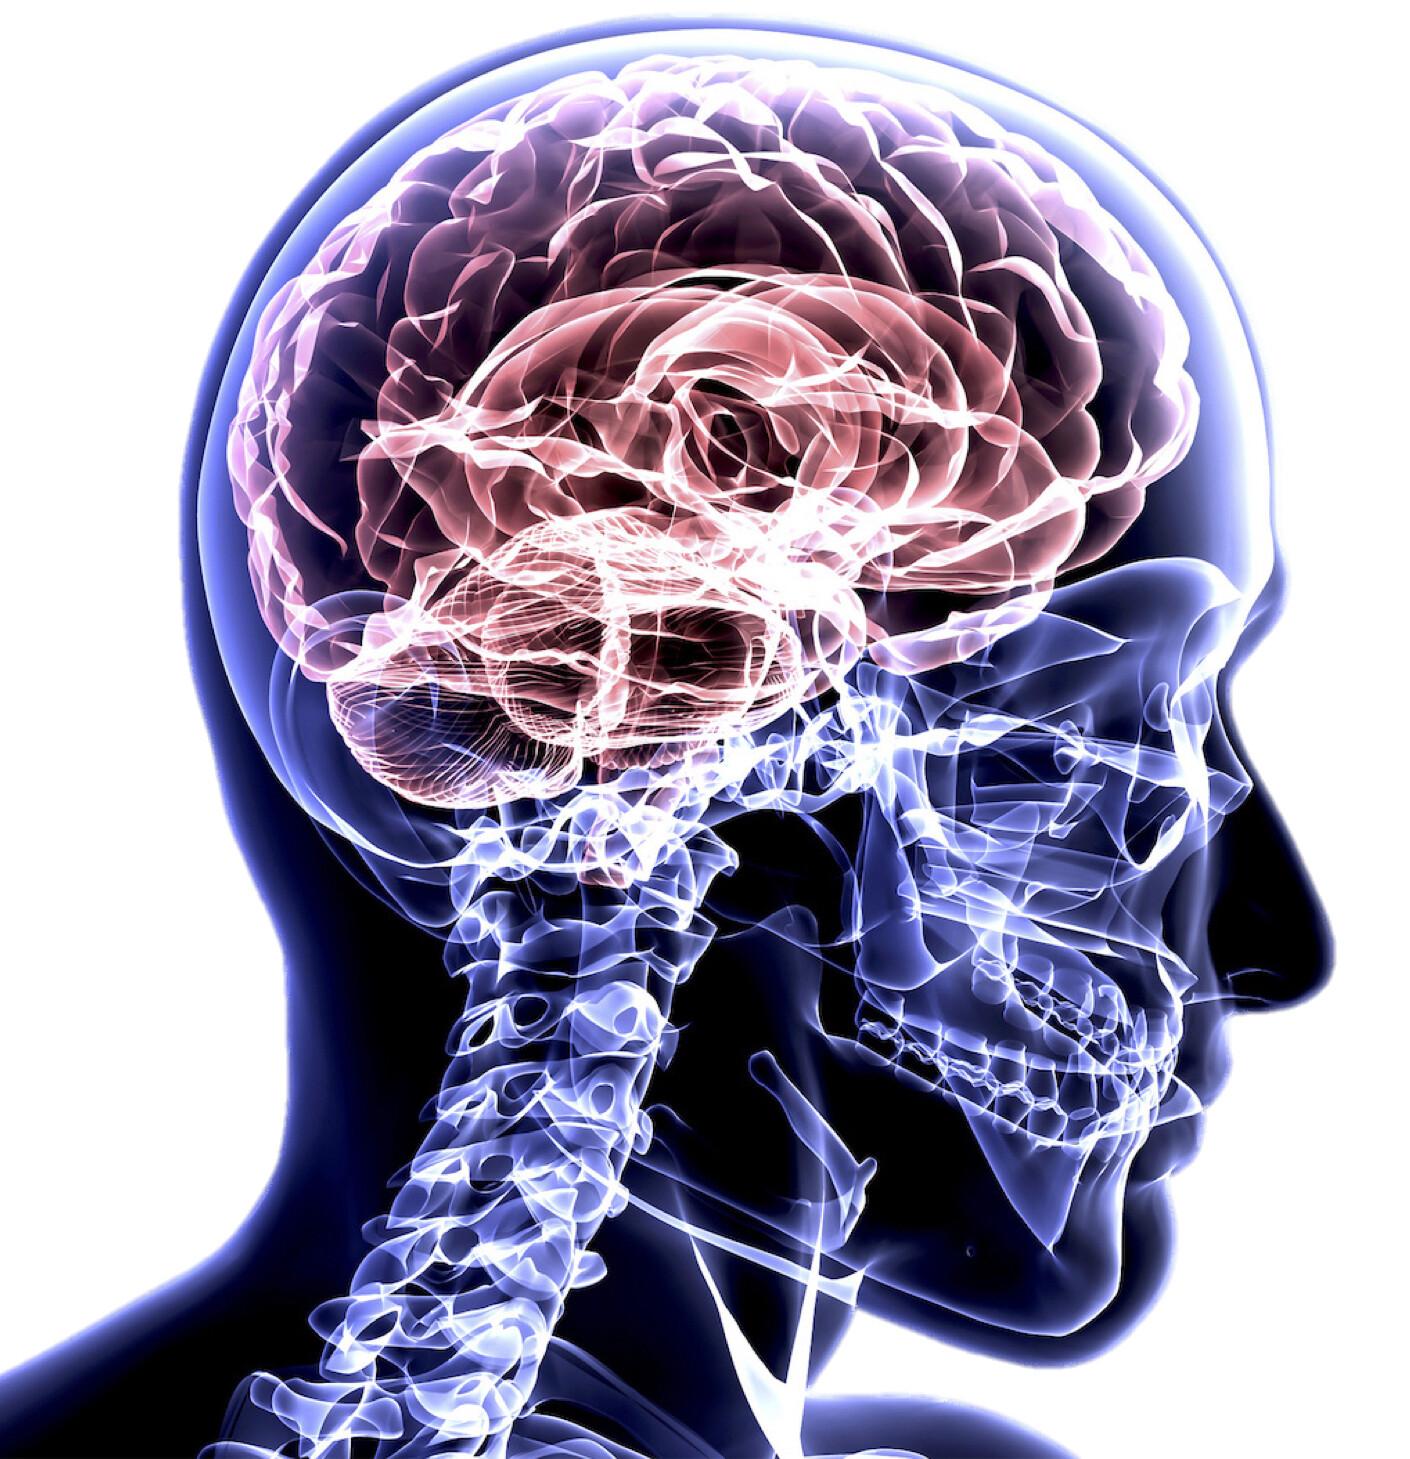 National Undergraduate Neuroanatomy Competition 2020